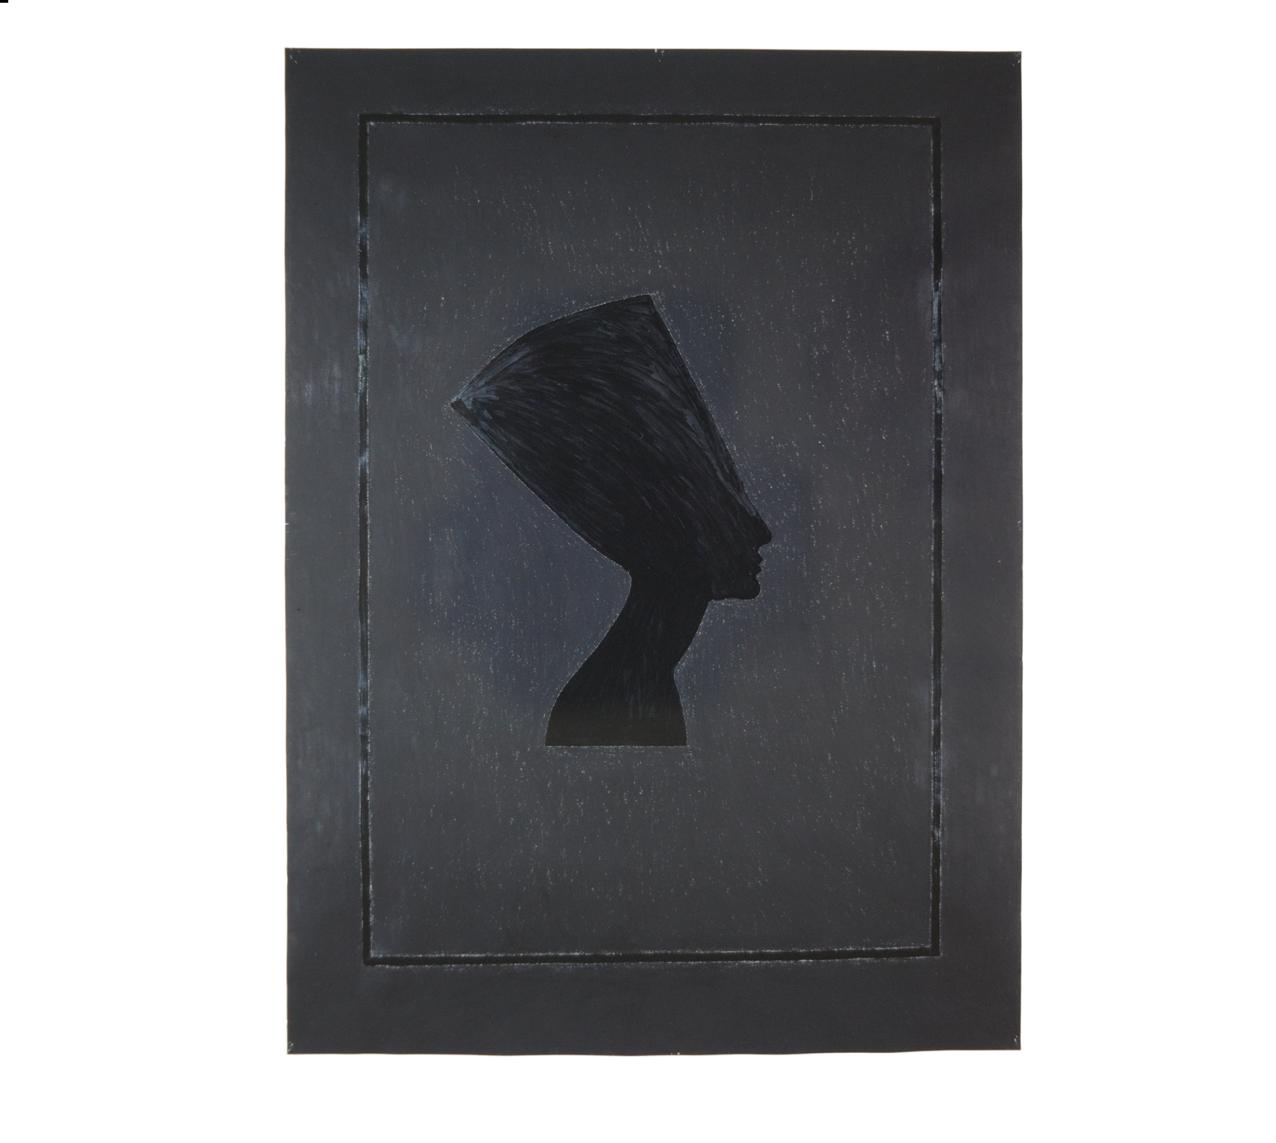 """Nofretete"" 1981, Kohle, Teer auf Papier, 157 x 115 cm - Foto Hadler/Stuhr"